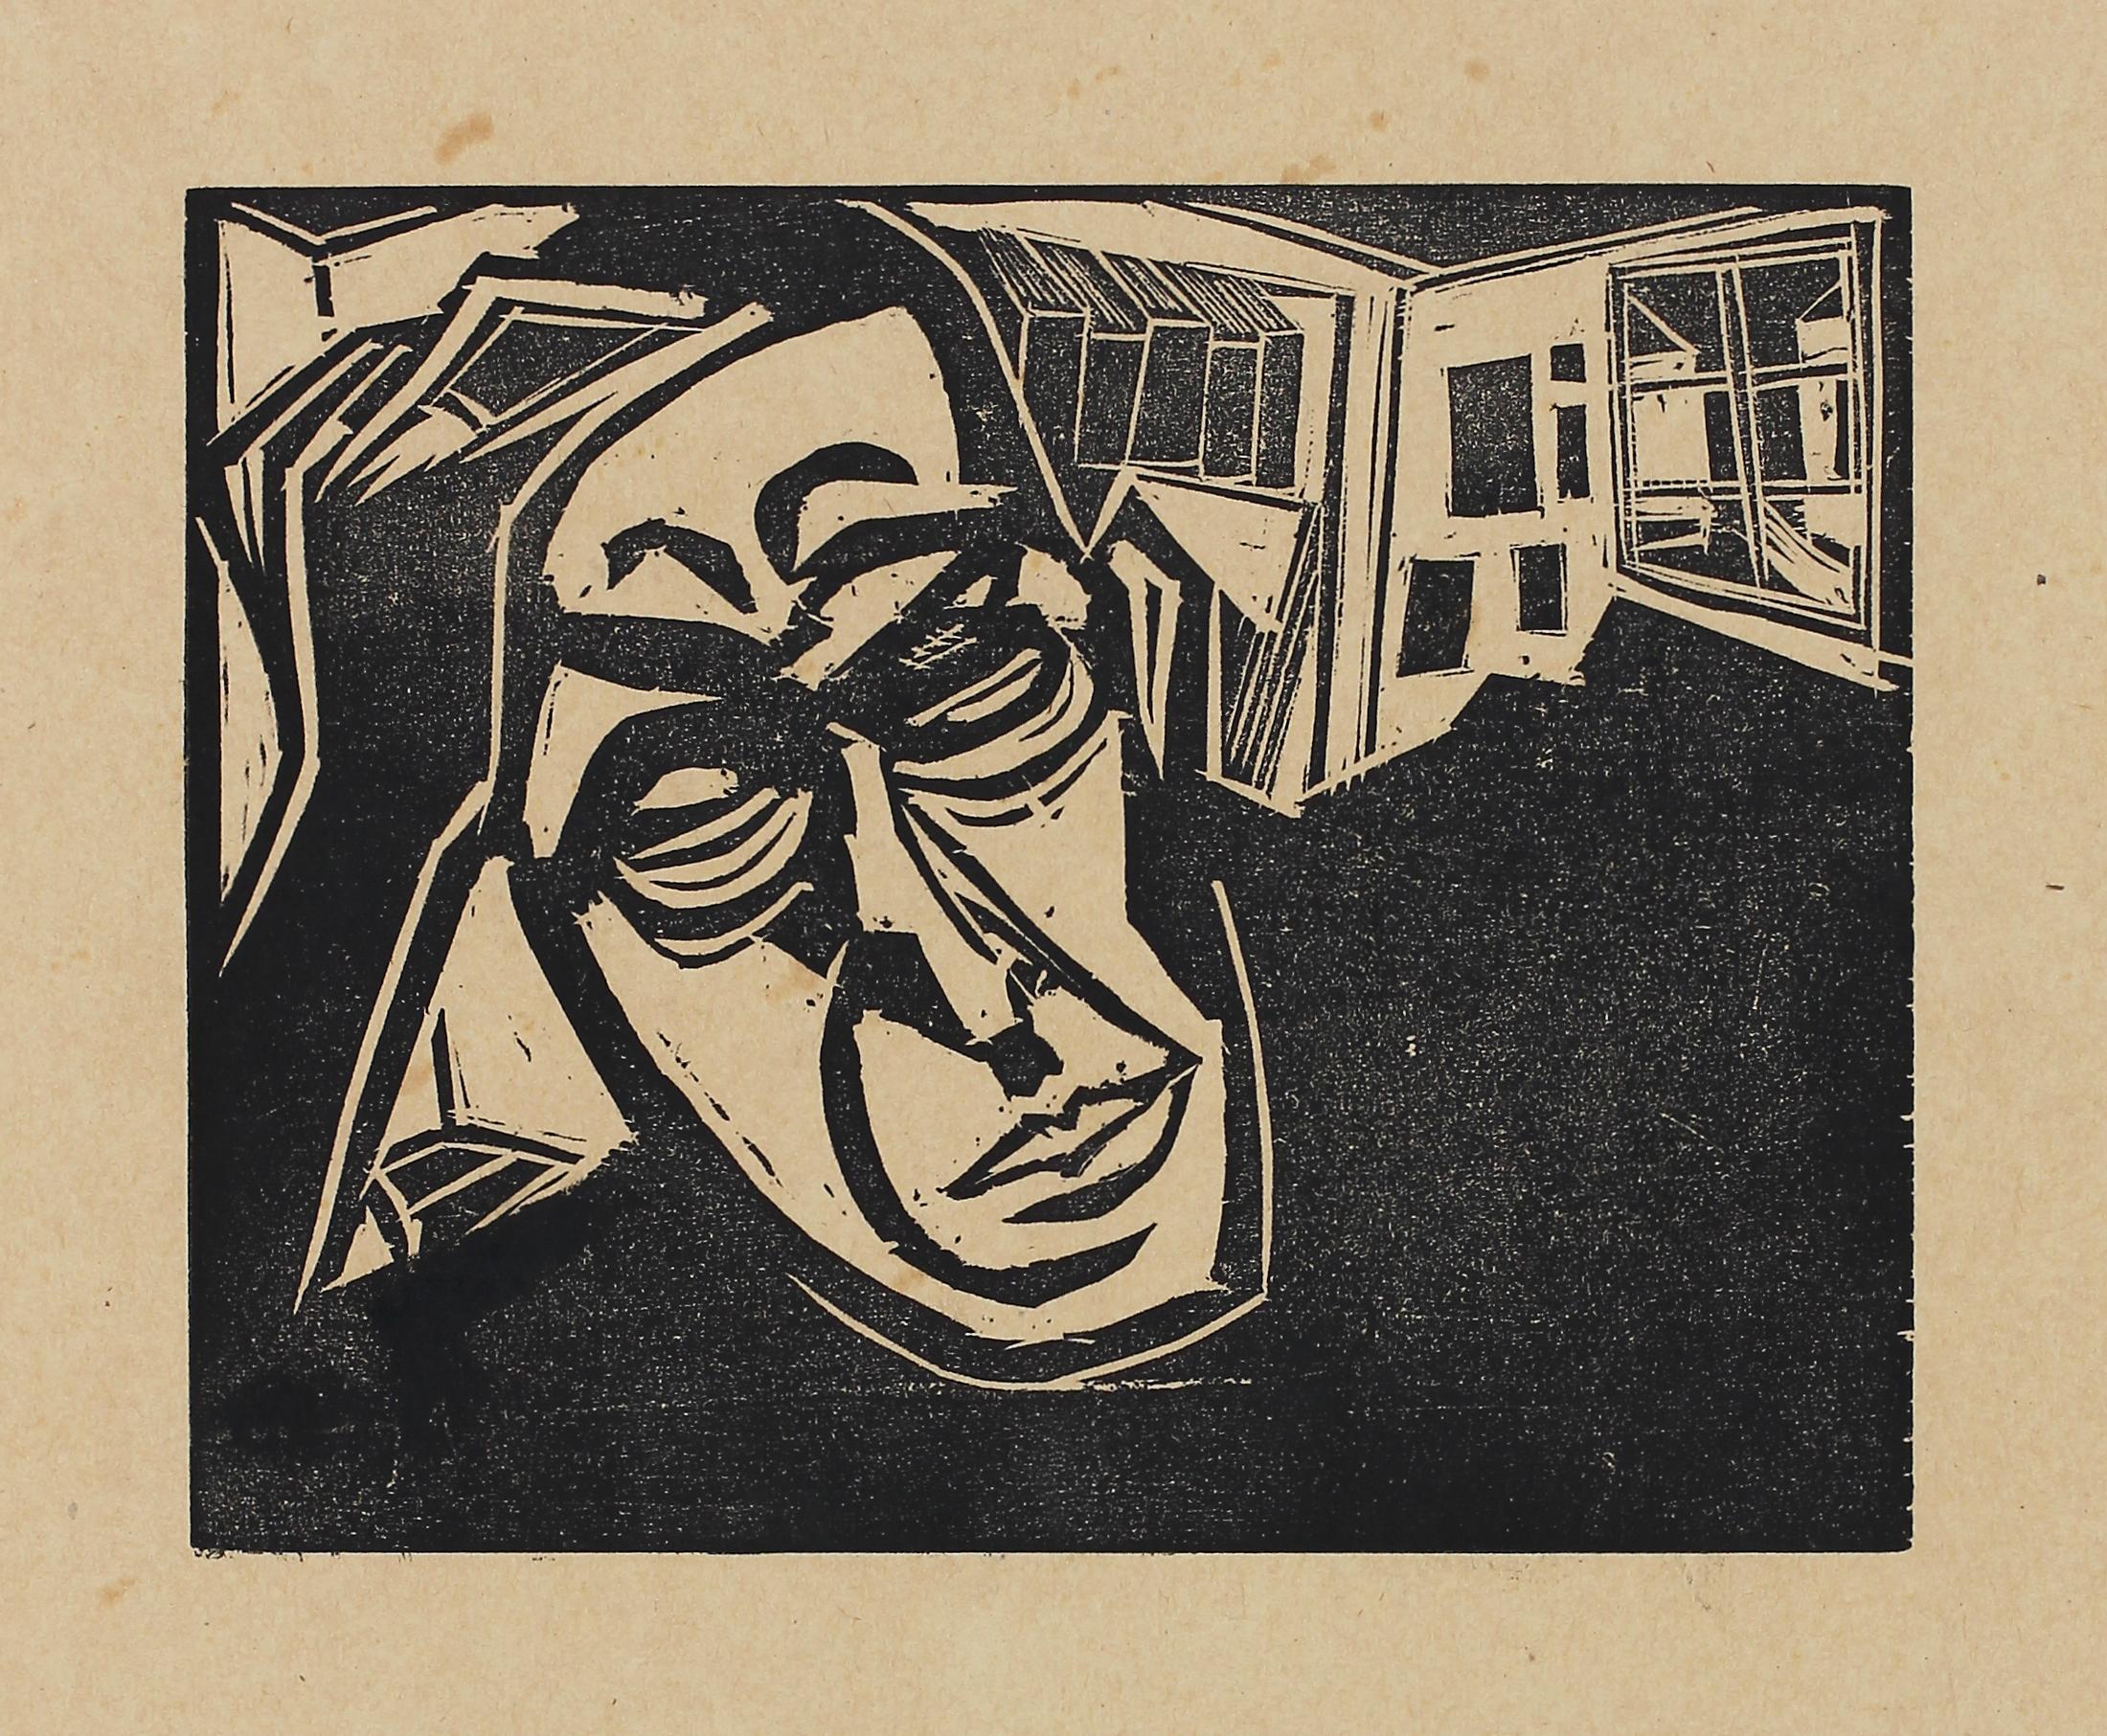 Britting (Portrait of the poet Georg Britting) by Josef Achmann